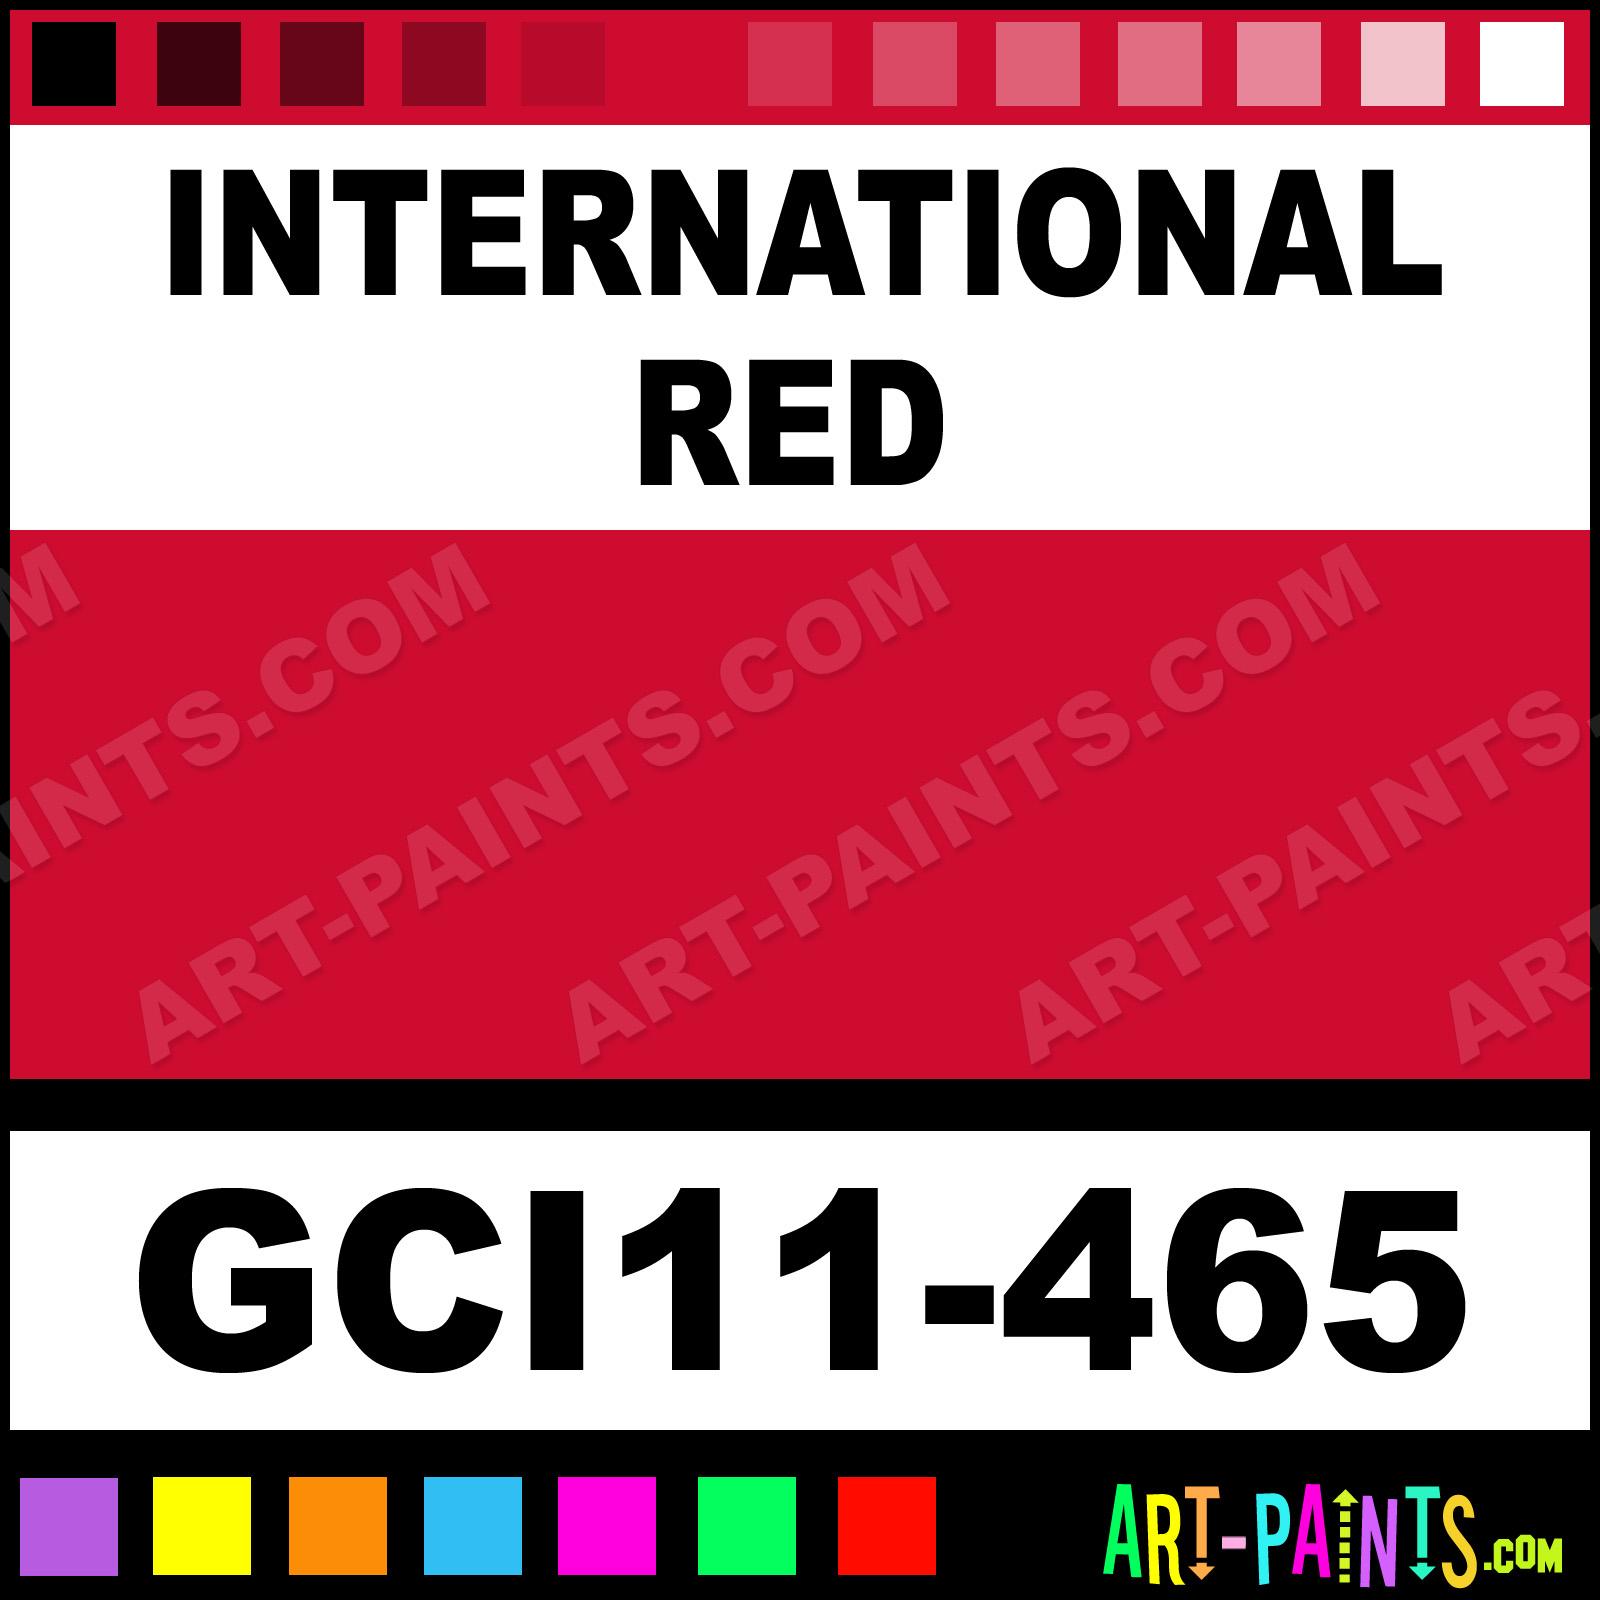 International Red Industrial Enamel Paints Gci11 465 International Red Paint International Red Color Gci Alkyd Industrial Paint Cd0b2f Art Paints Com